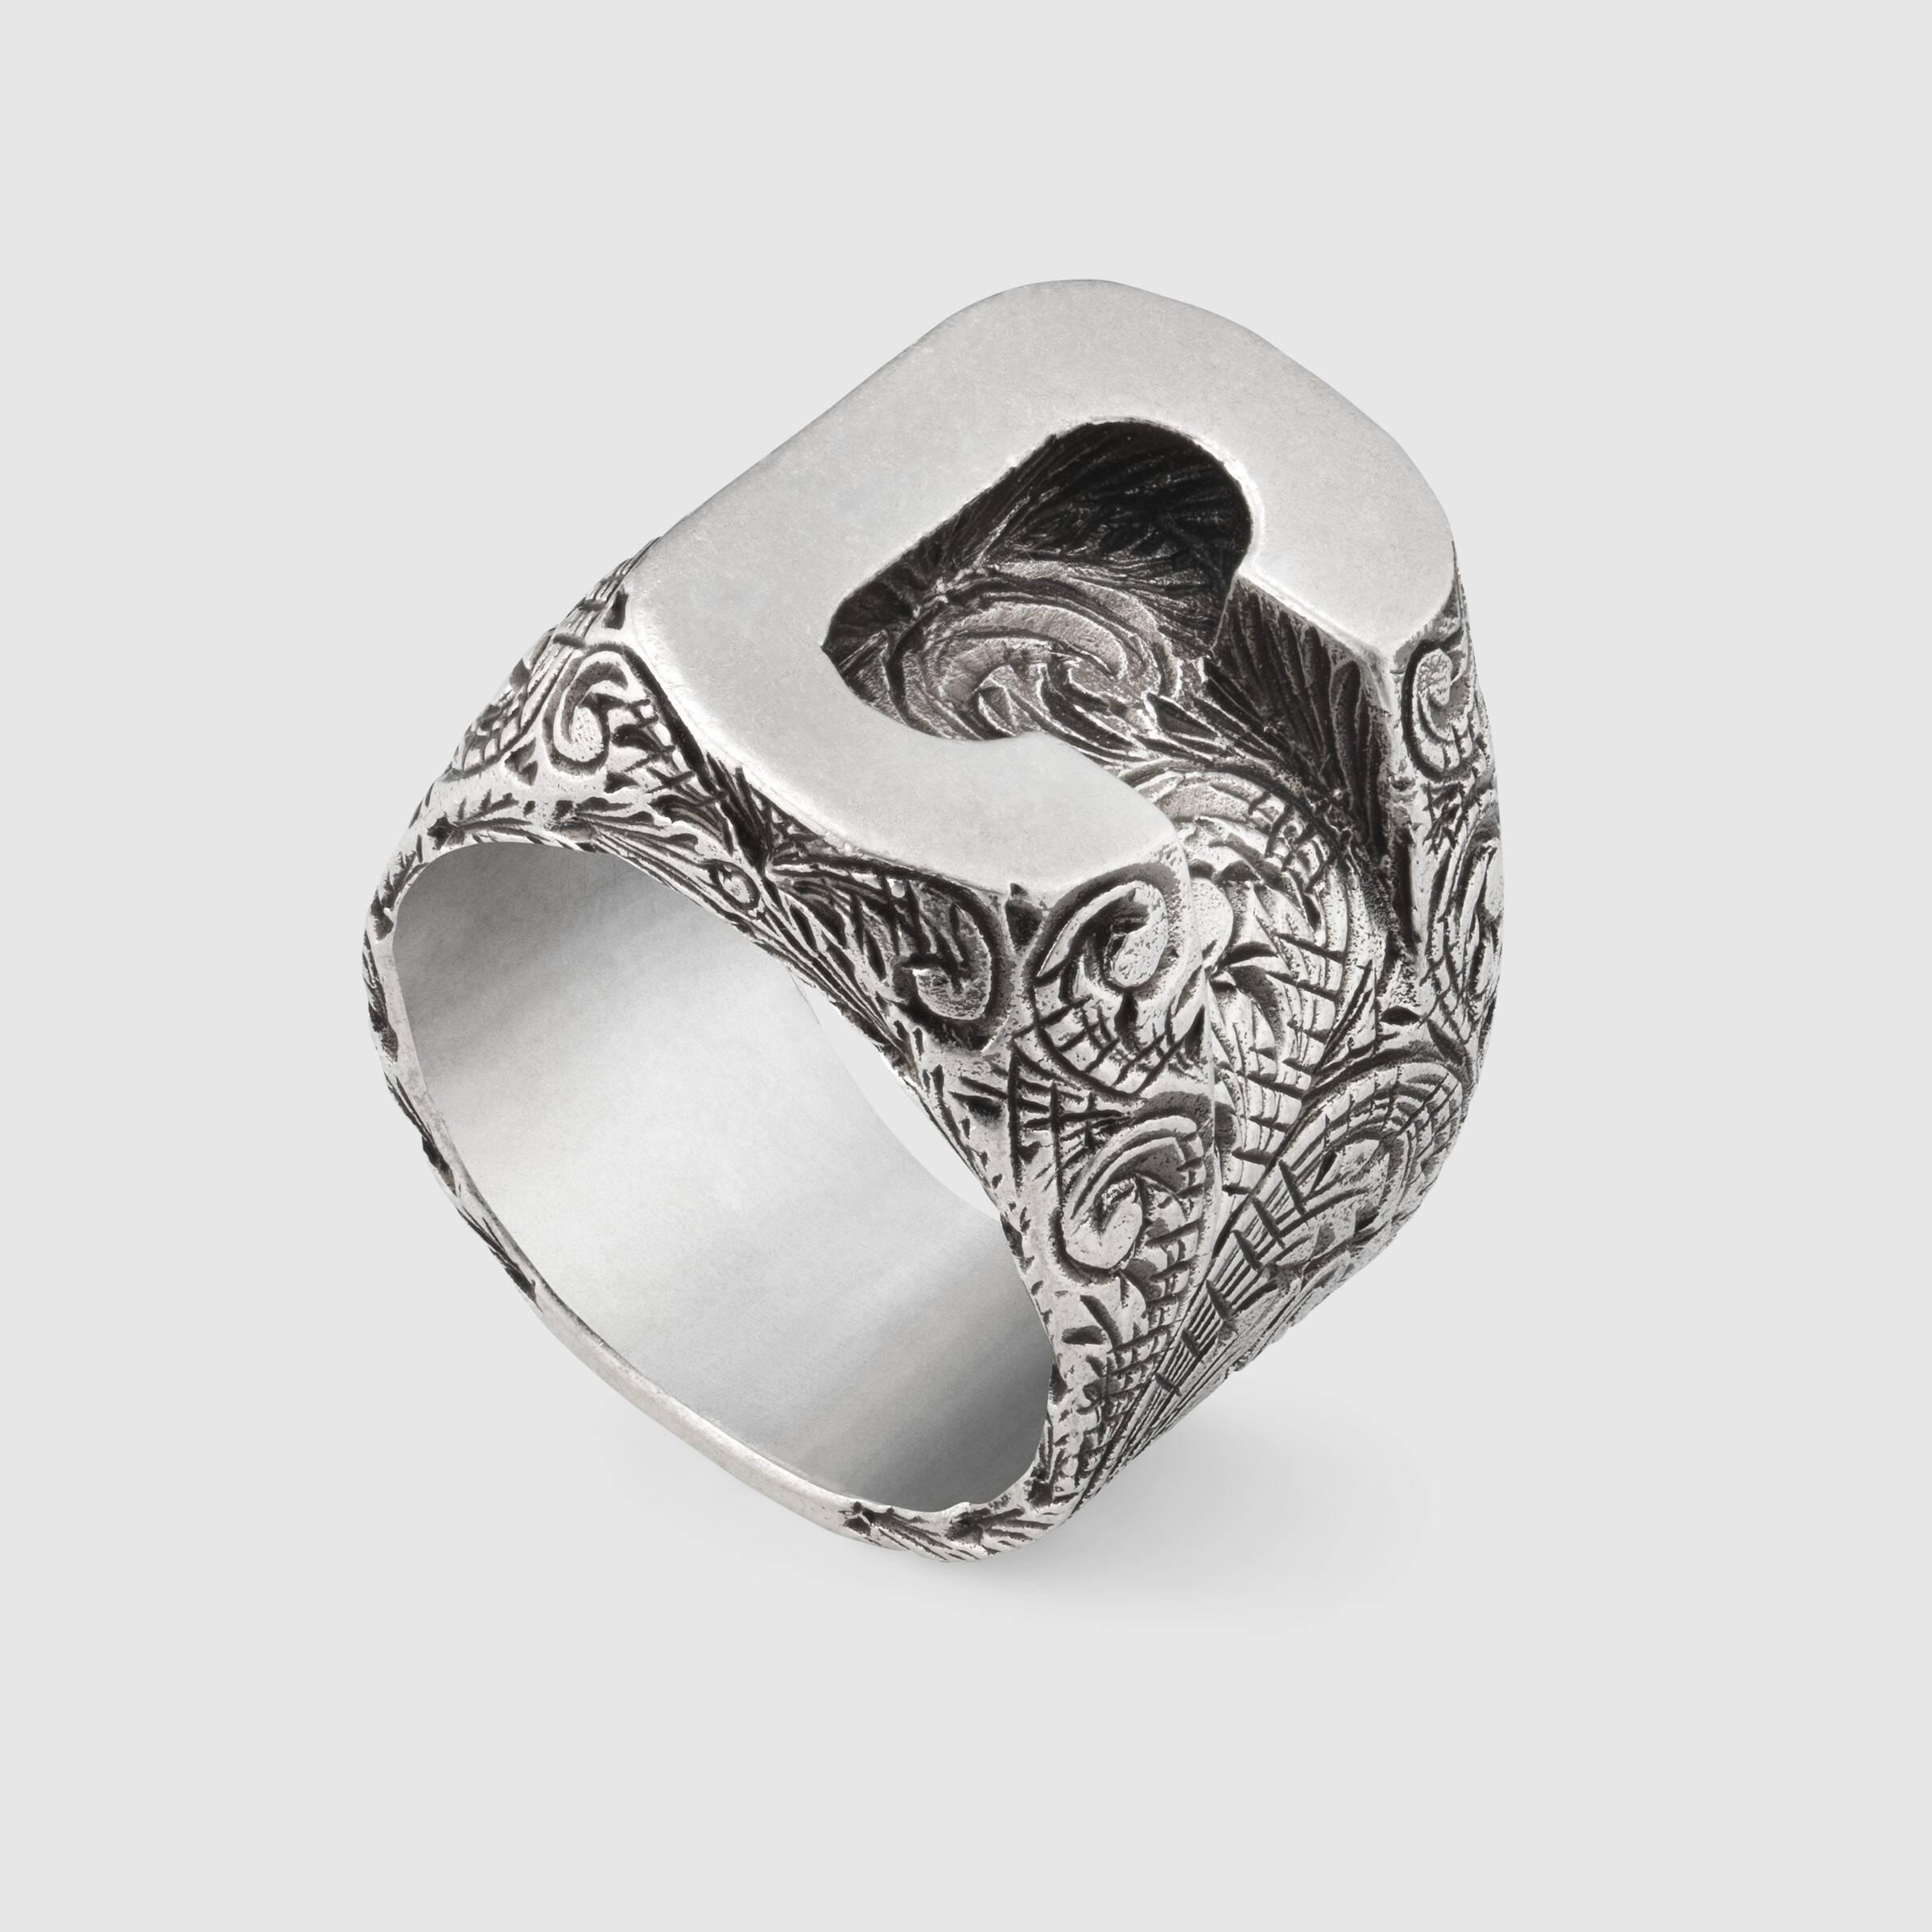 Artisan Owl Double Chevron Stainless Steel Statement Ring